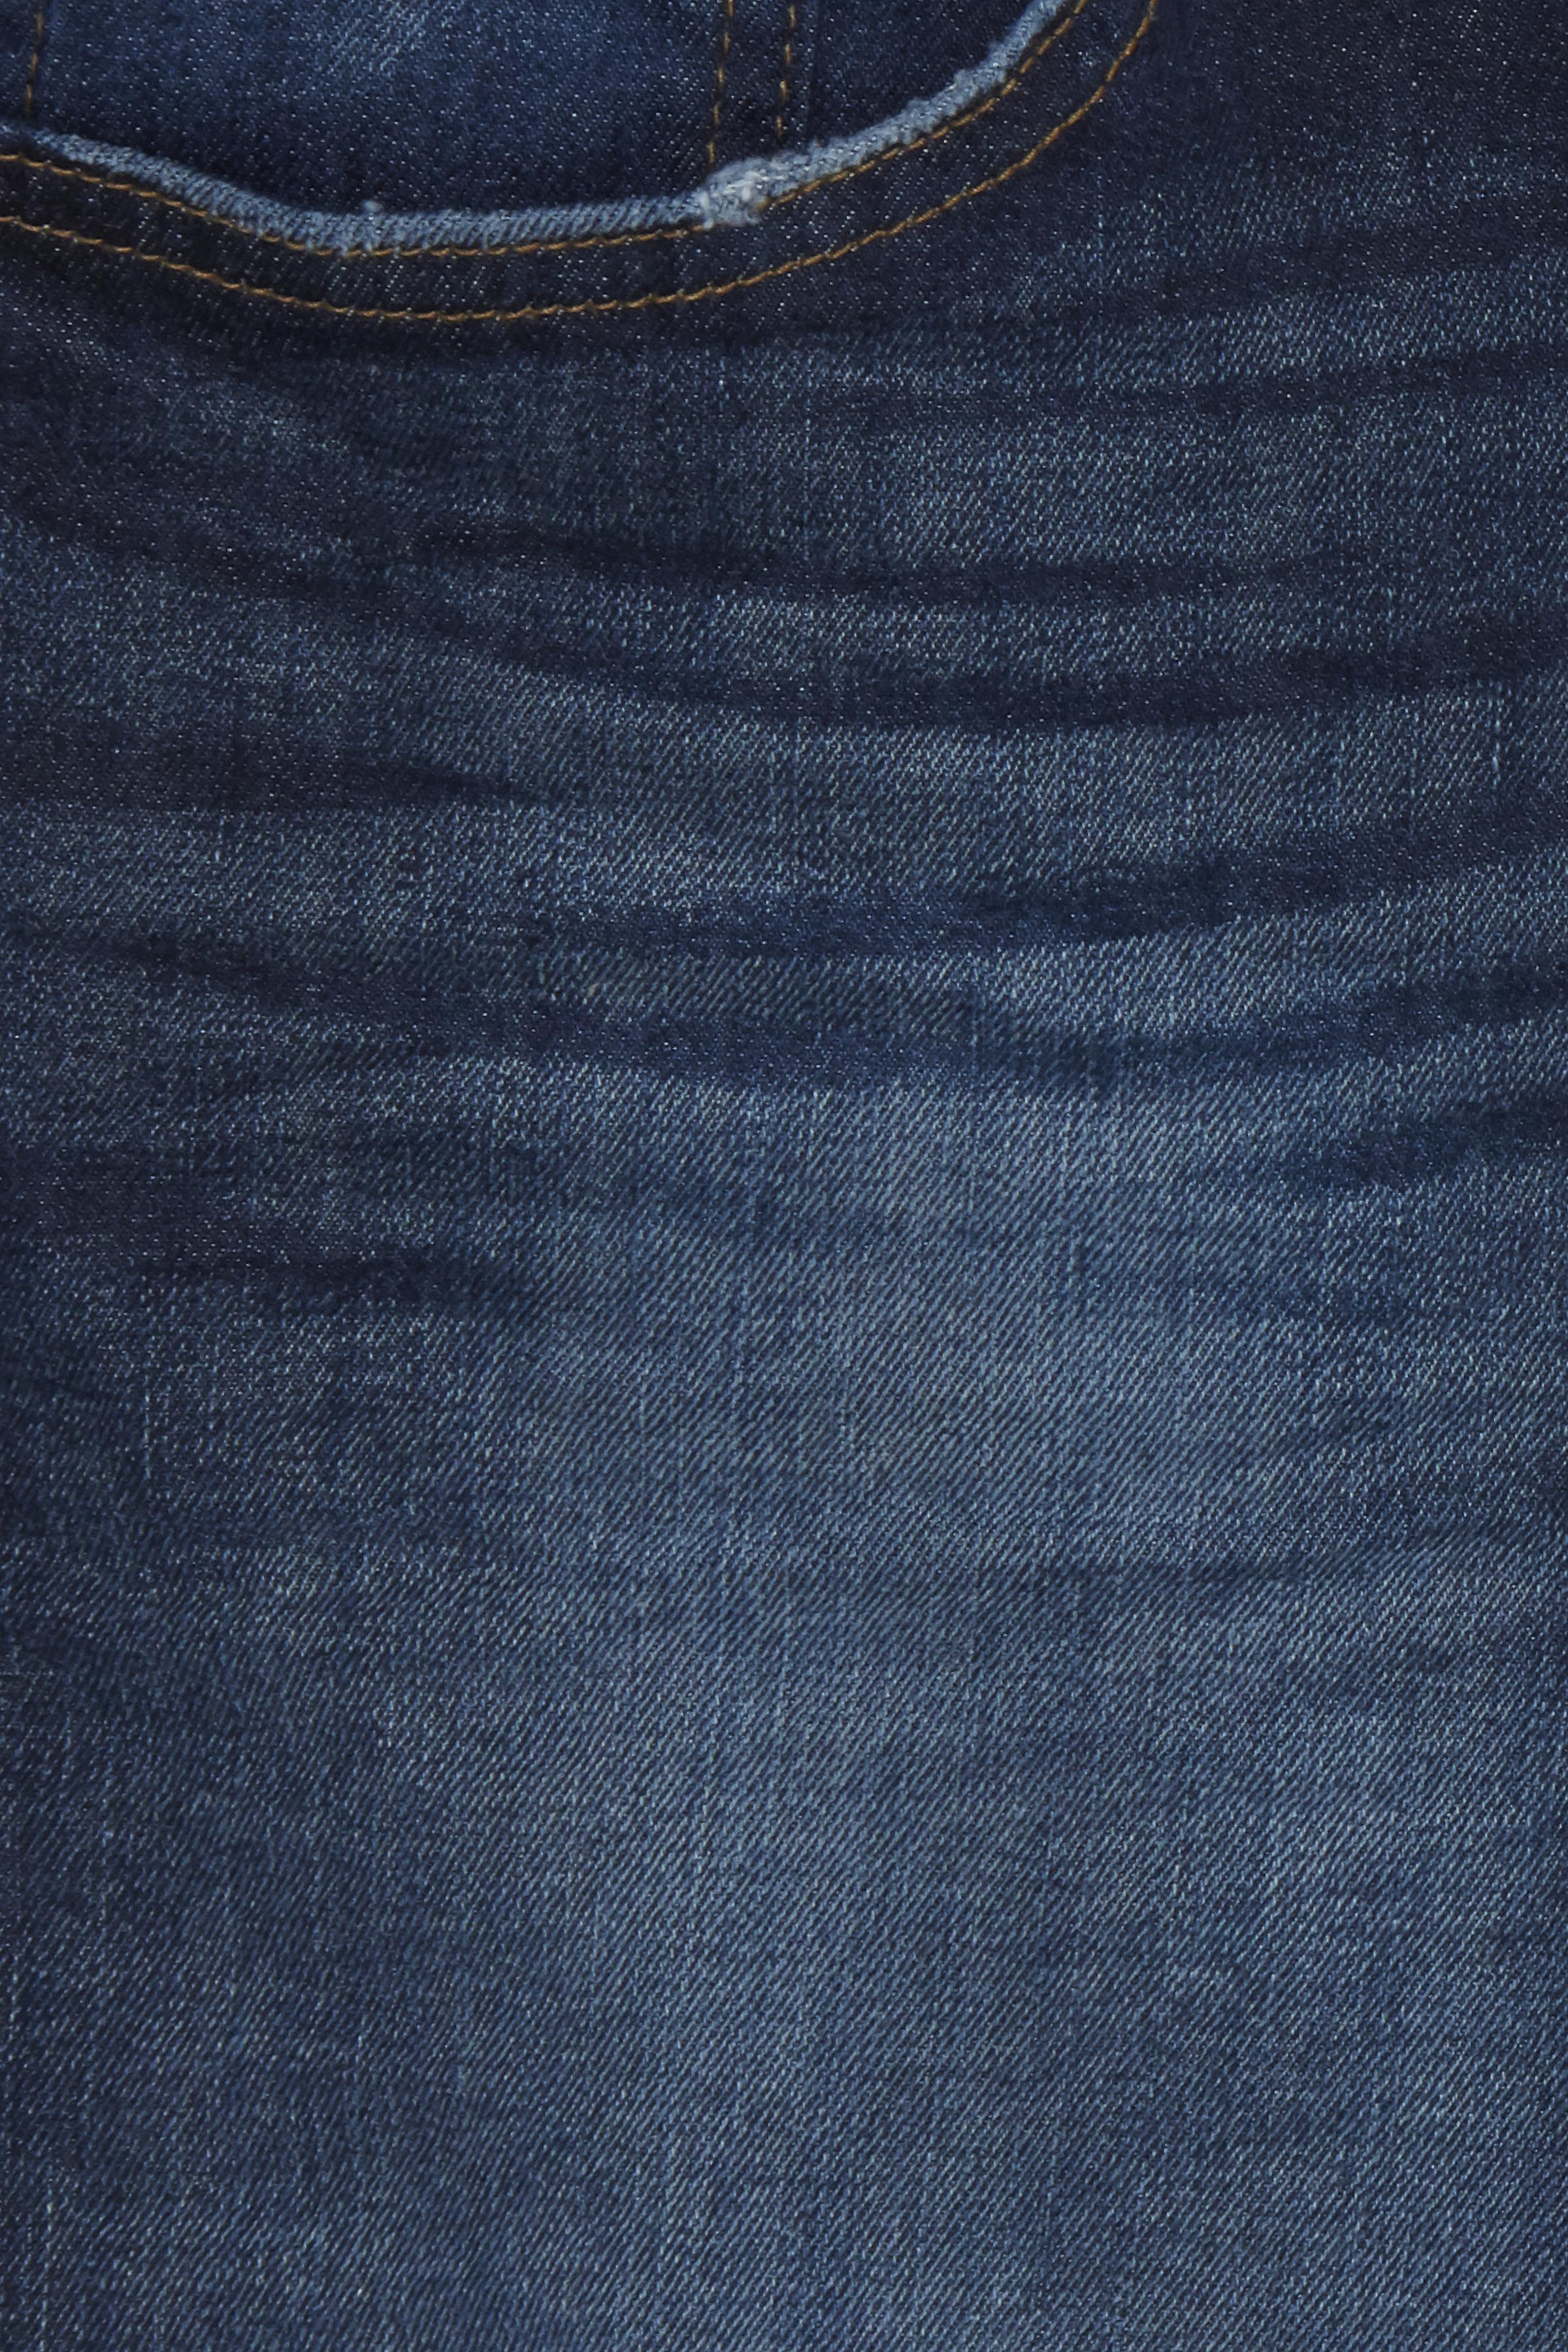 Denim dark blue Denimshorts – Køb Denim dark blue Denimshorts fra str. M-3XL her